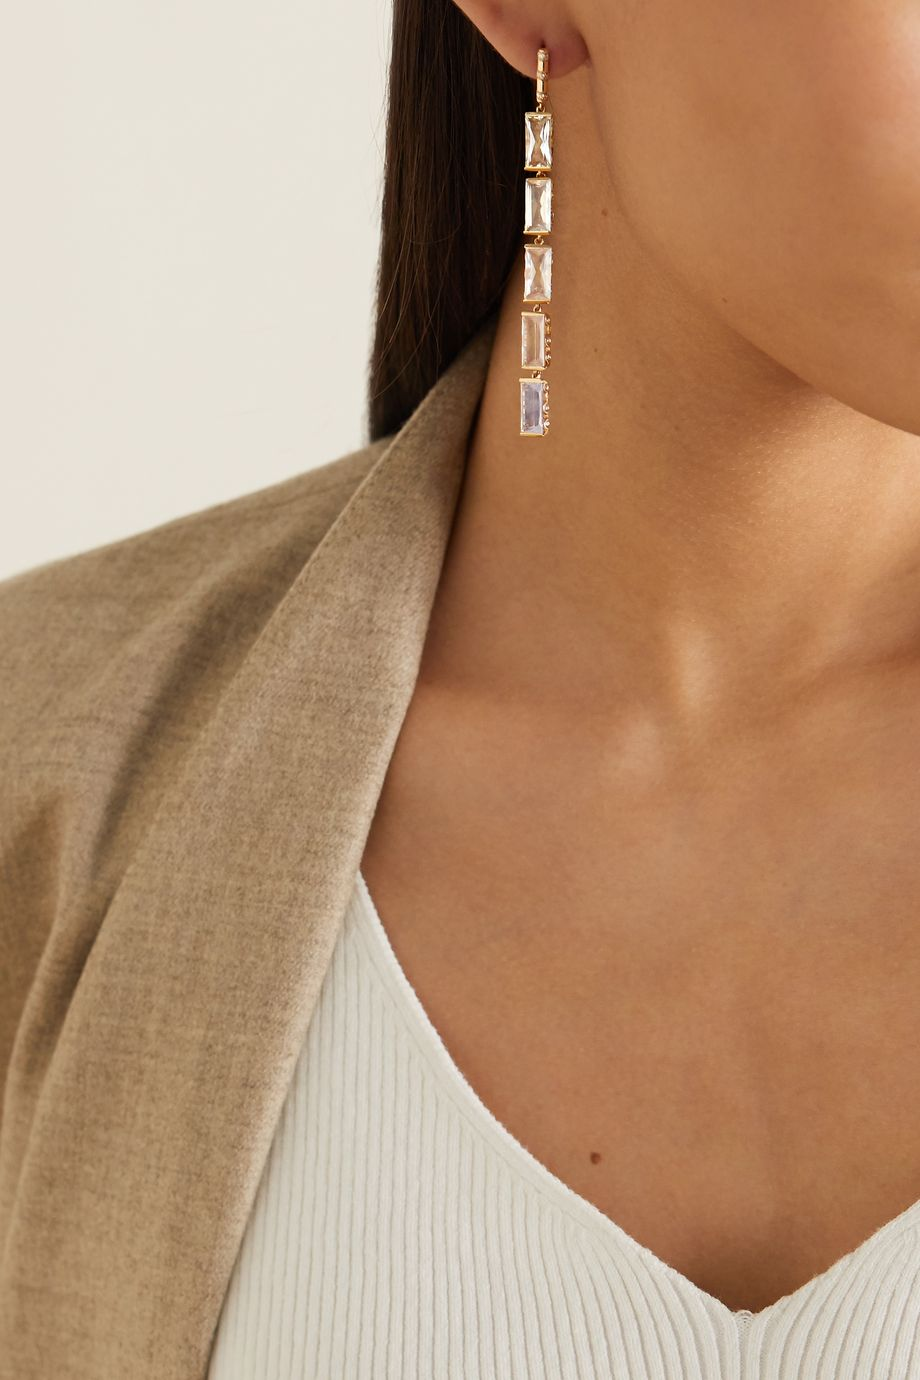 Alice Cicolini Memphis Bubble Baguette 14-karat gold multi-stone earrings